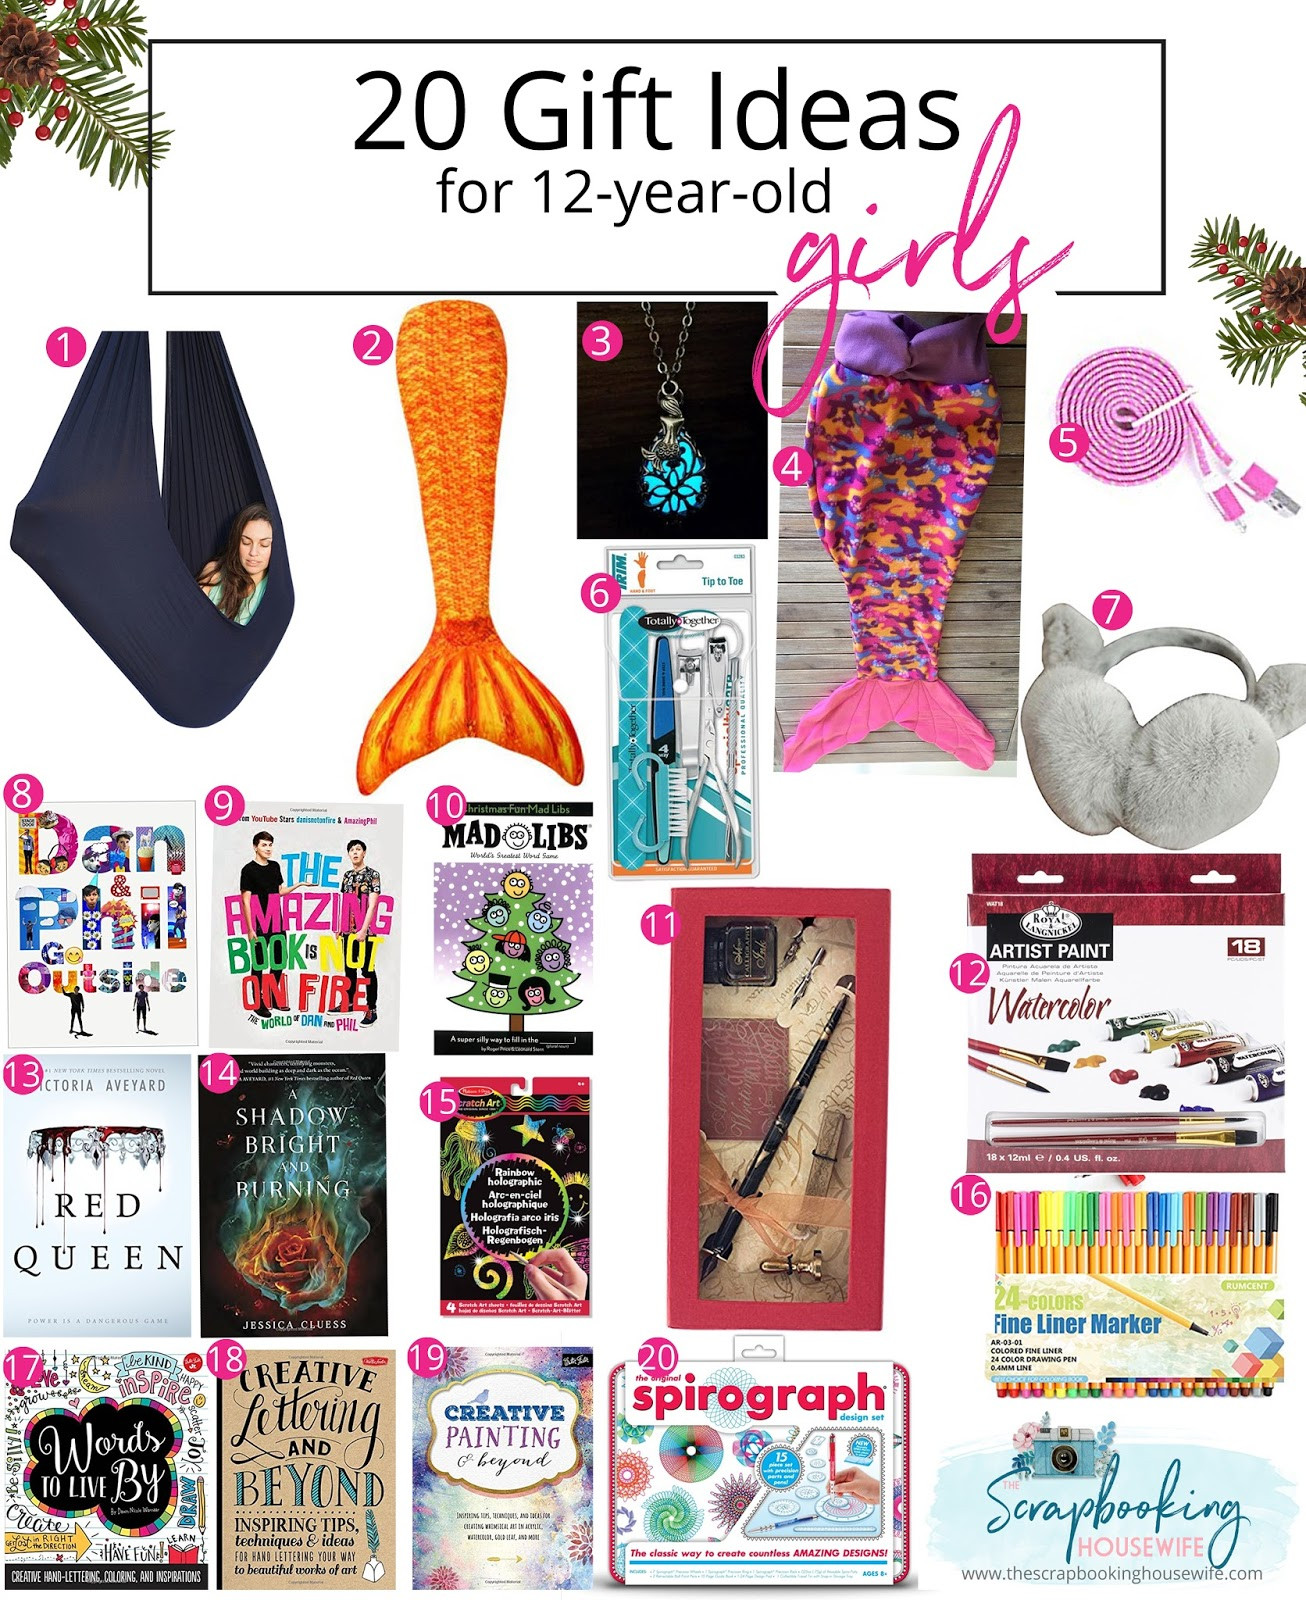 12 Year Old Girl Birthday Gift Ideas  Ellabella Designs 20 GIFT IDEAS FOR 12 YEAR OLD TWEEN